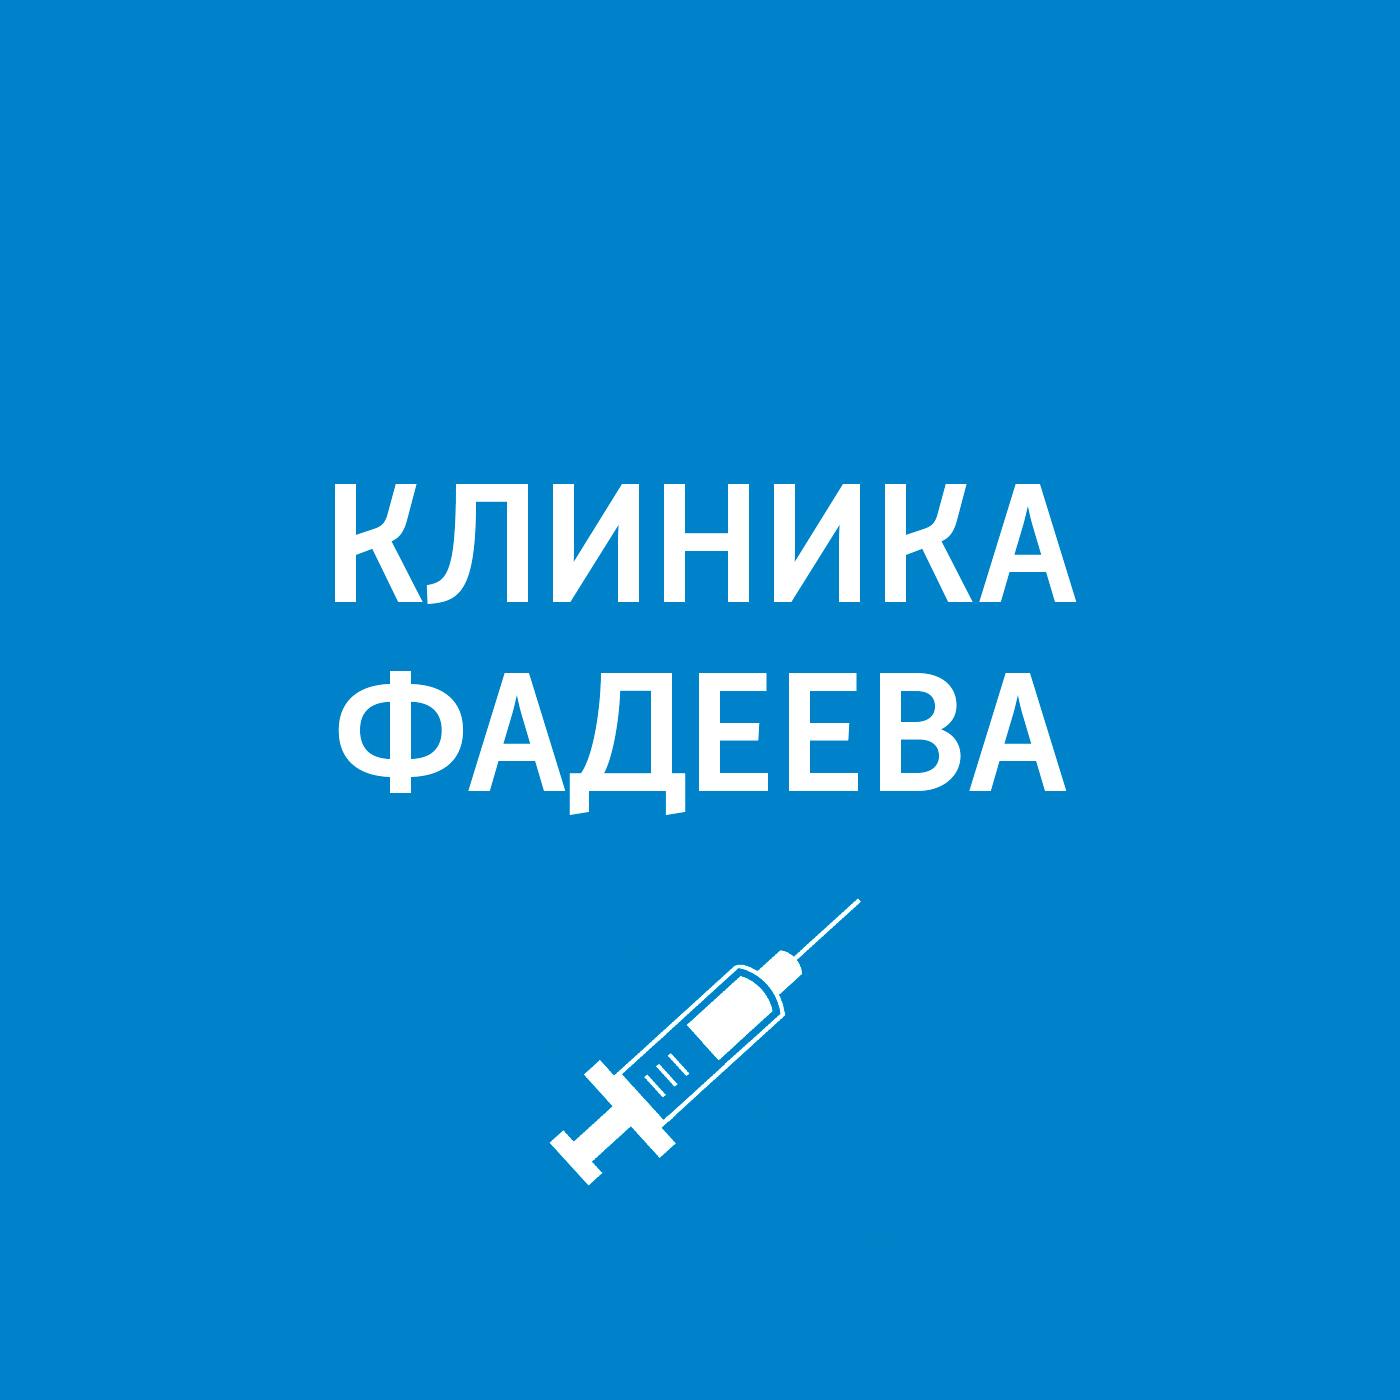 Фото - Пётр Фадеев Врач-нарколог пётр фадеев врач неотложной помощи